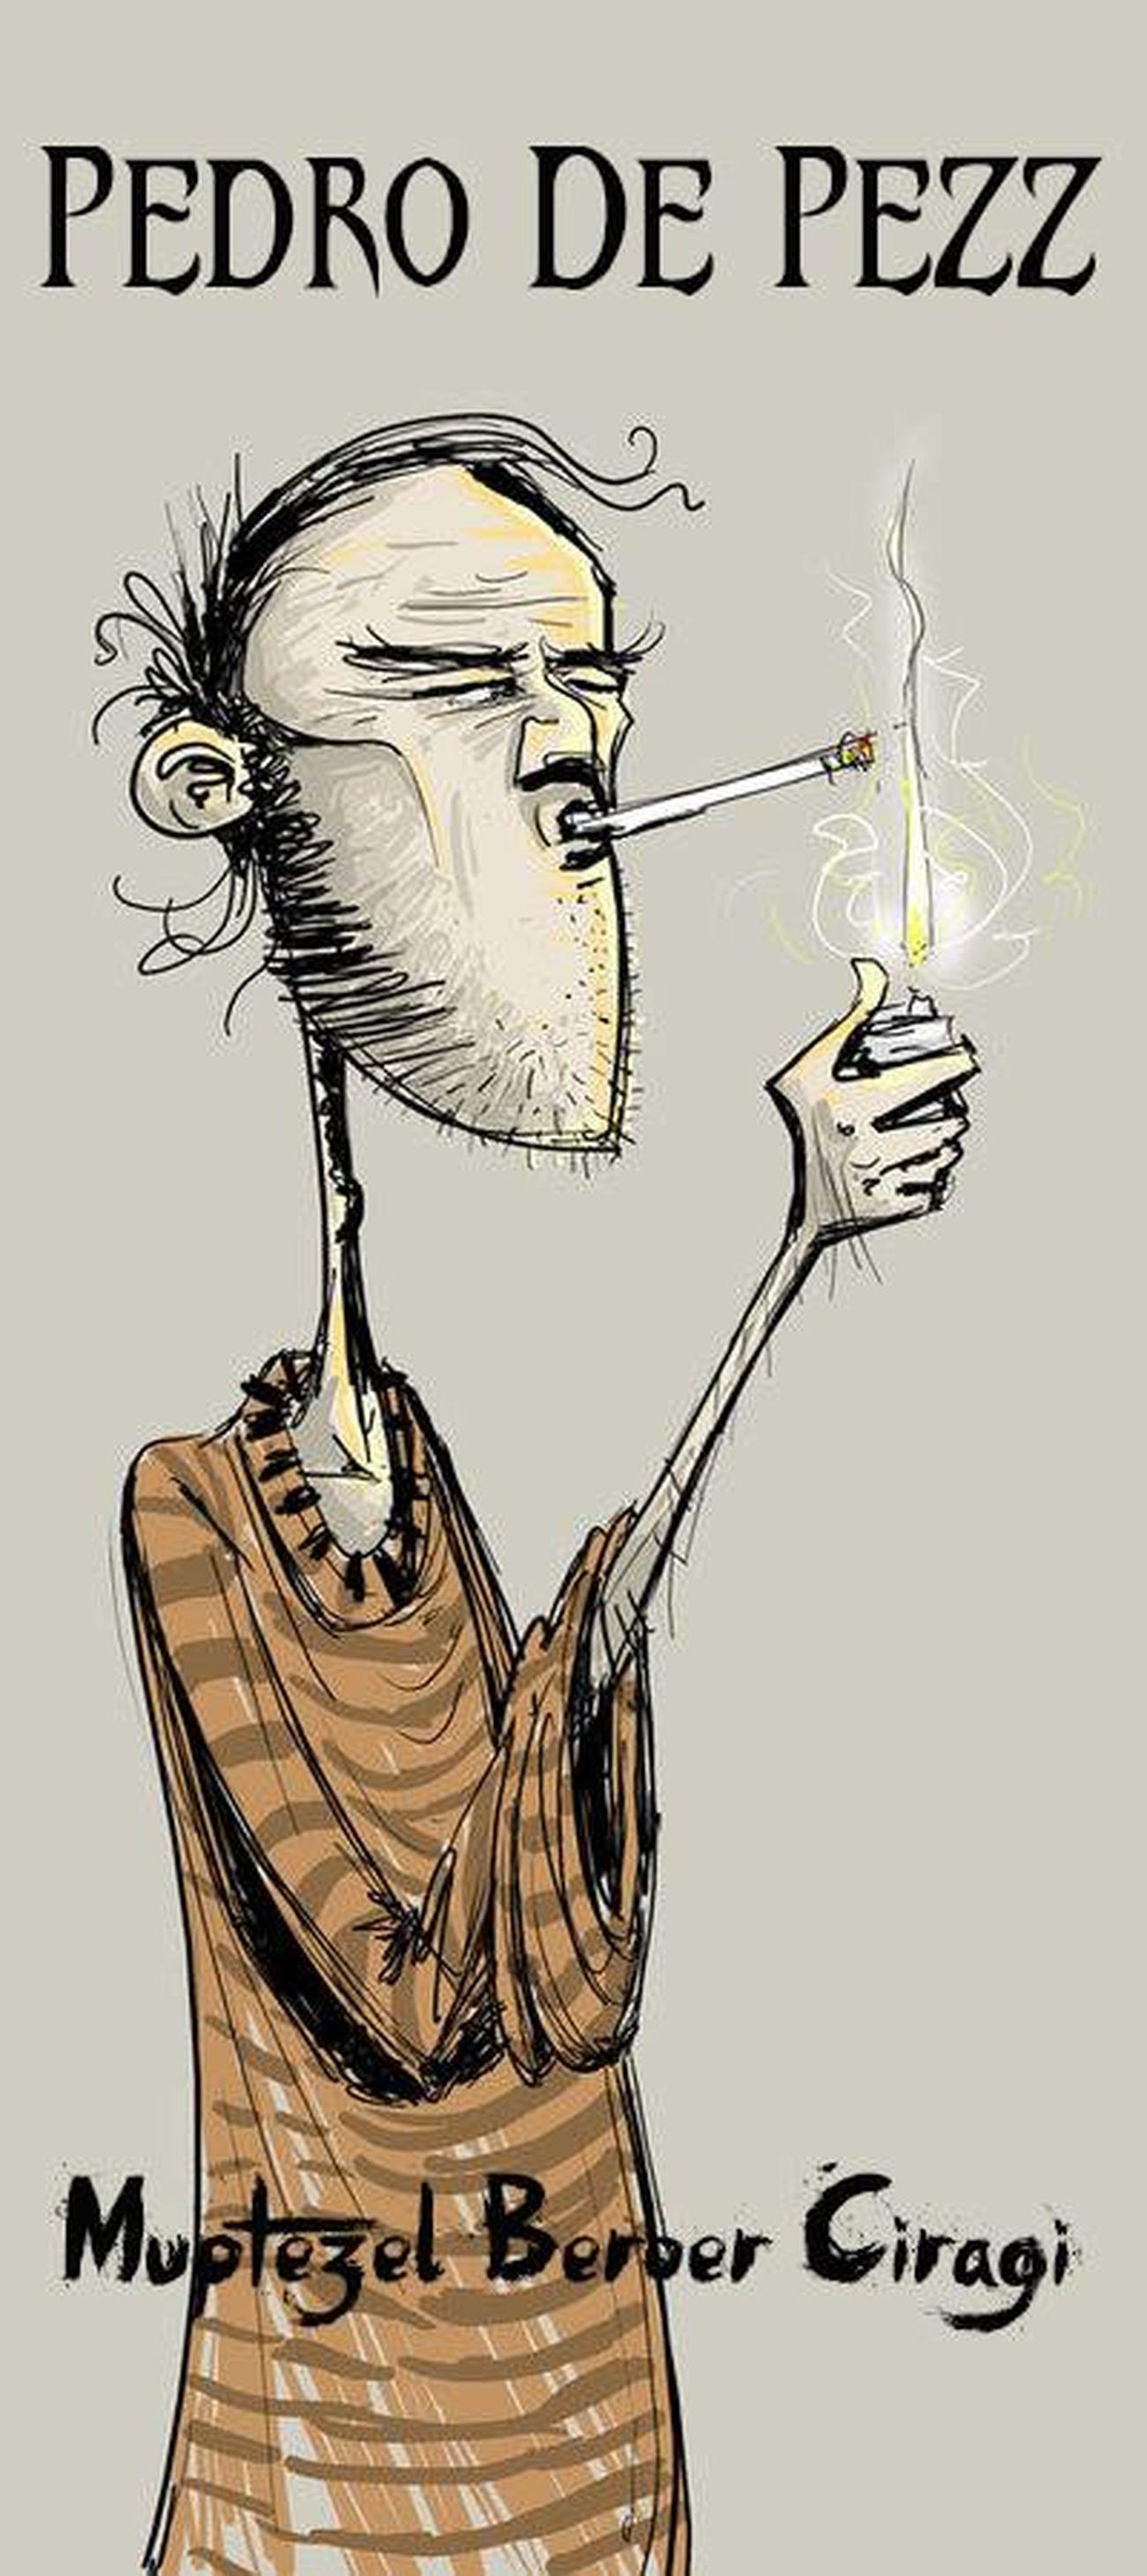 Rap Abstract Cigarette  Pedro Pedro De Pezz maafaka !